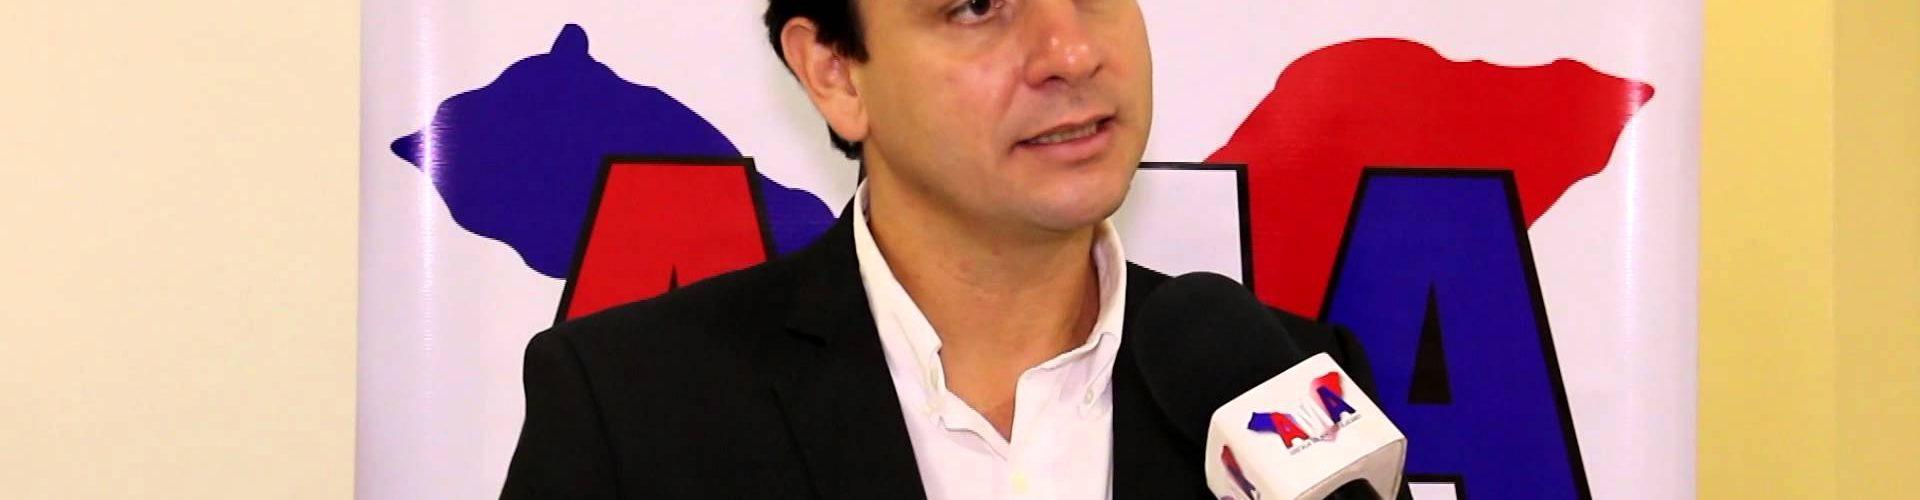 marcelobeltrao